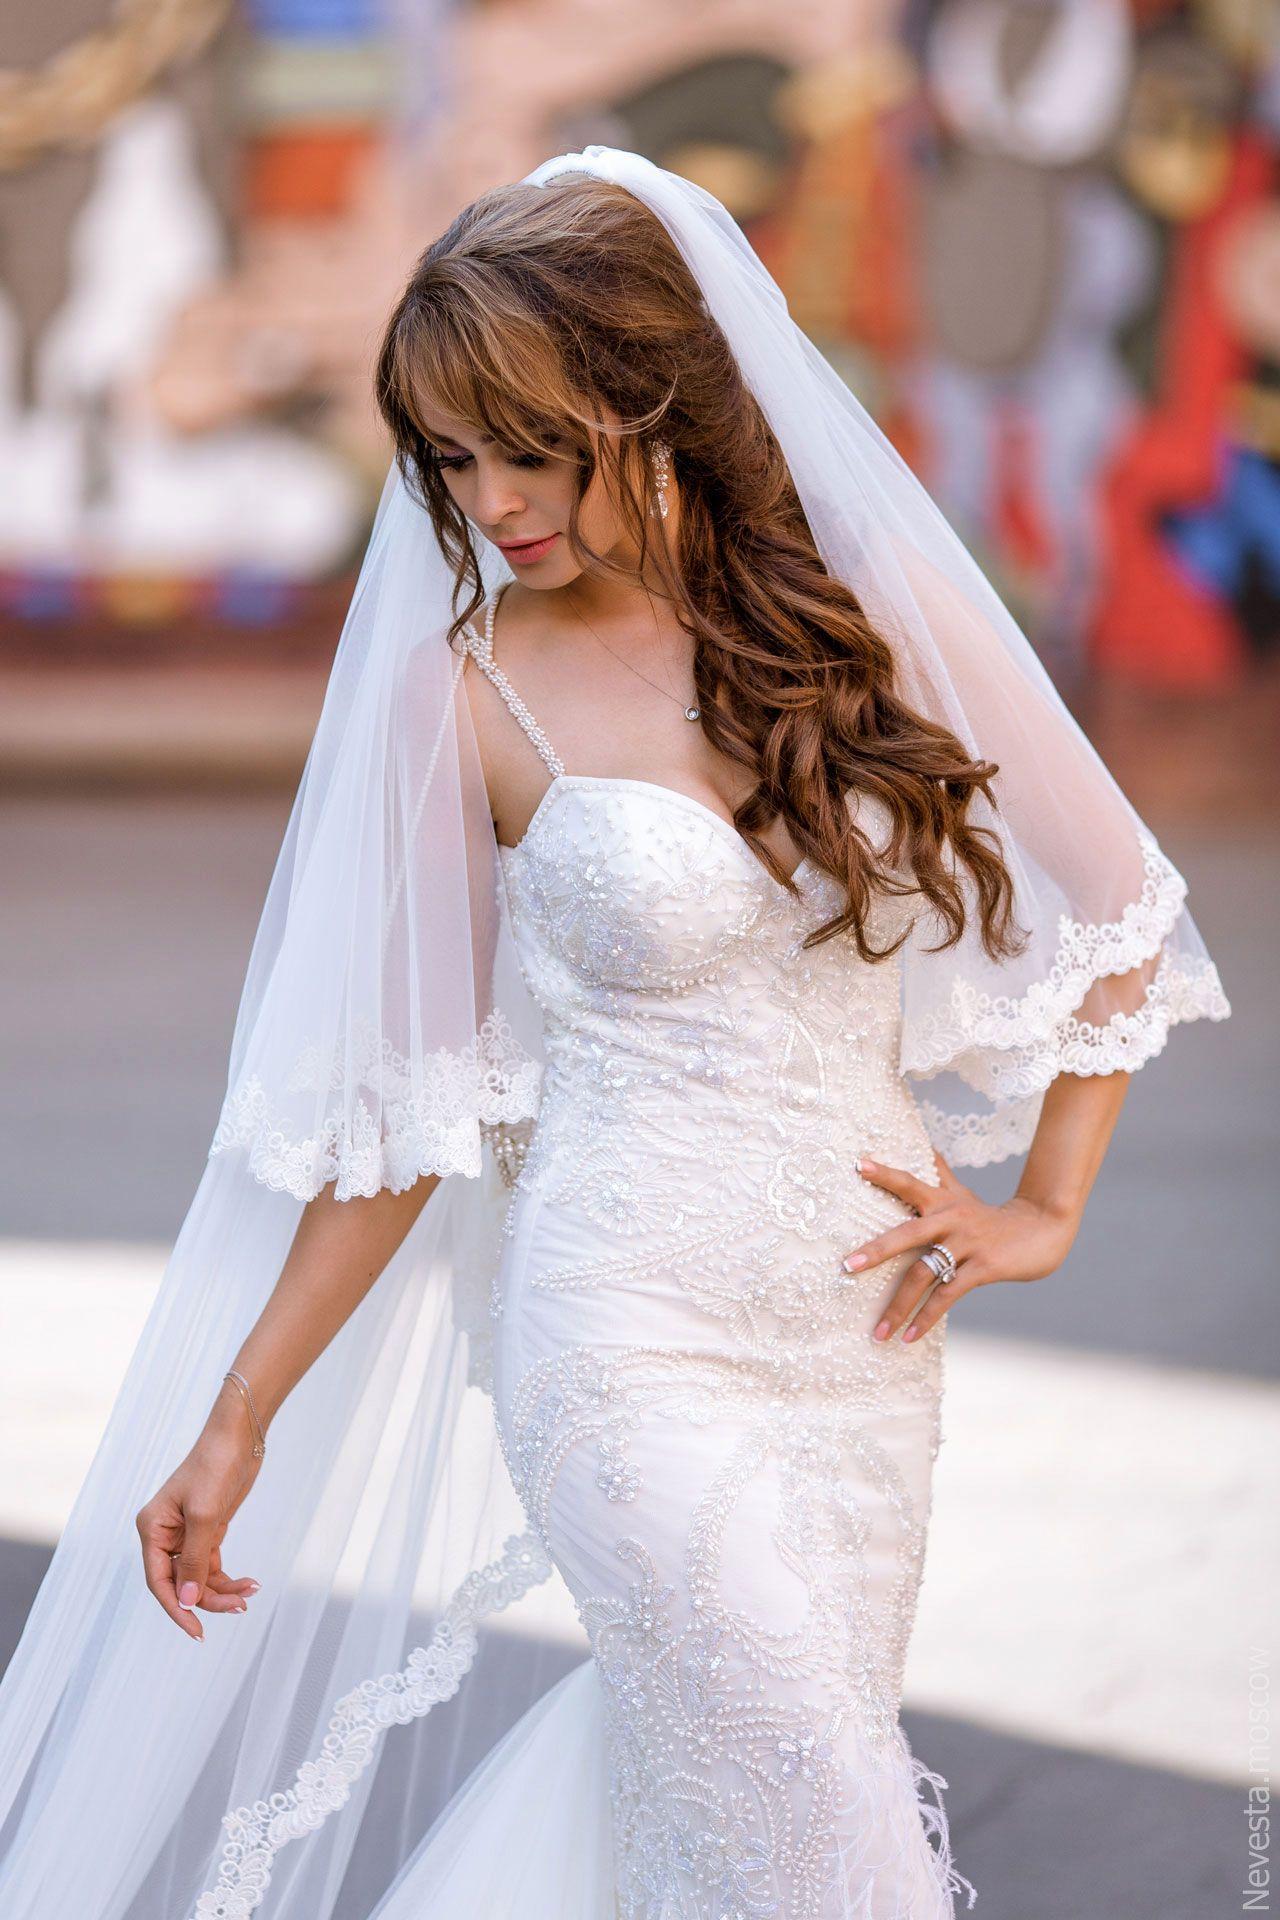 Актриса Анна Калашникова в образе белого лебедя фото 32